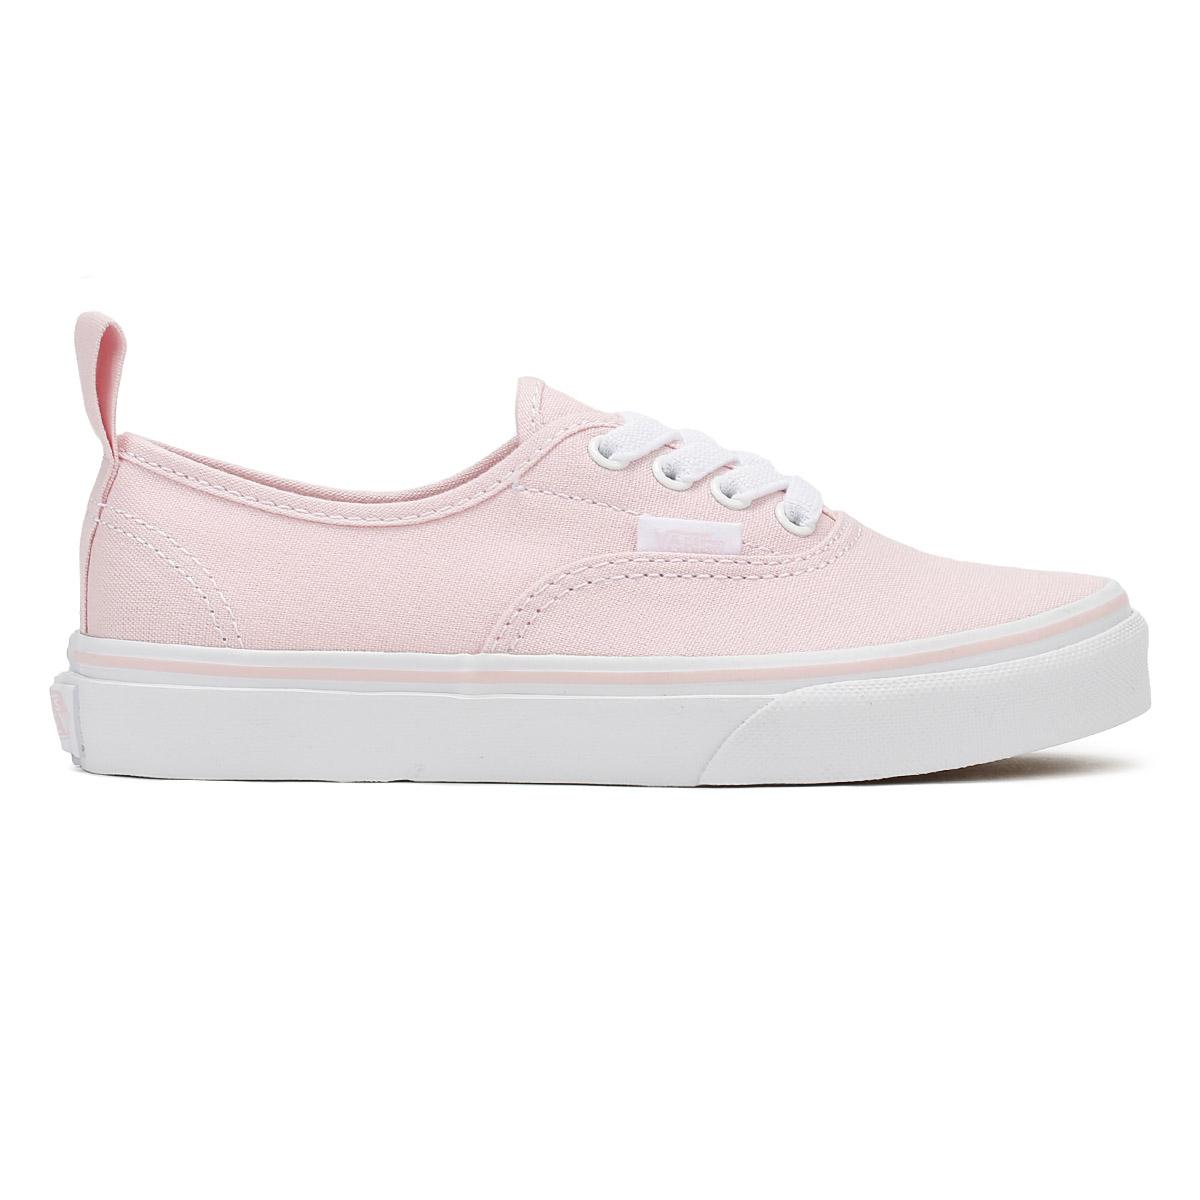 4388d6a94c4c87 Vans Kids Chalk Pink   True White Authentic Trainers Girls Skate Shoes